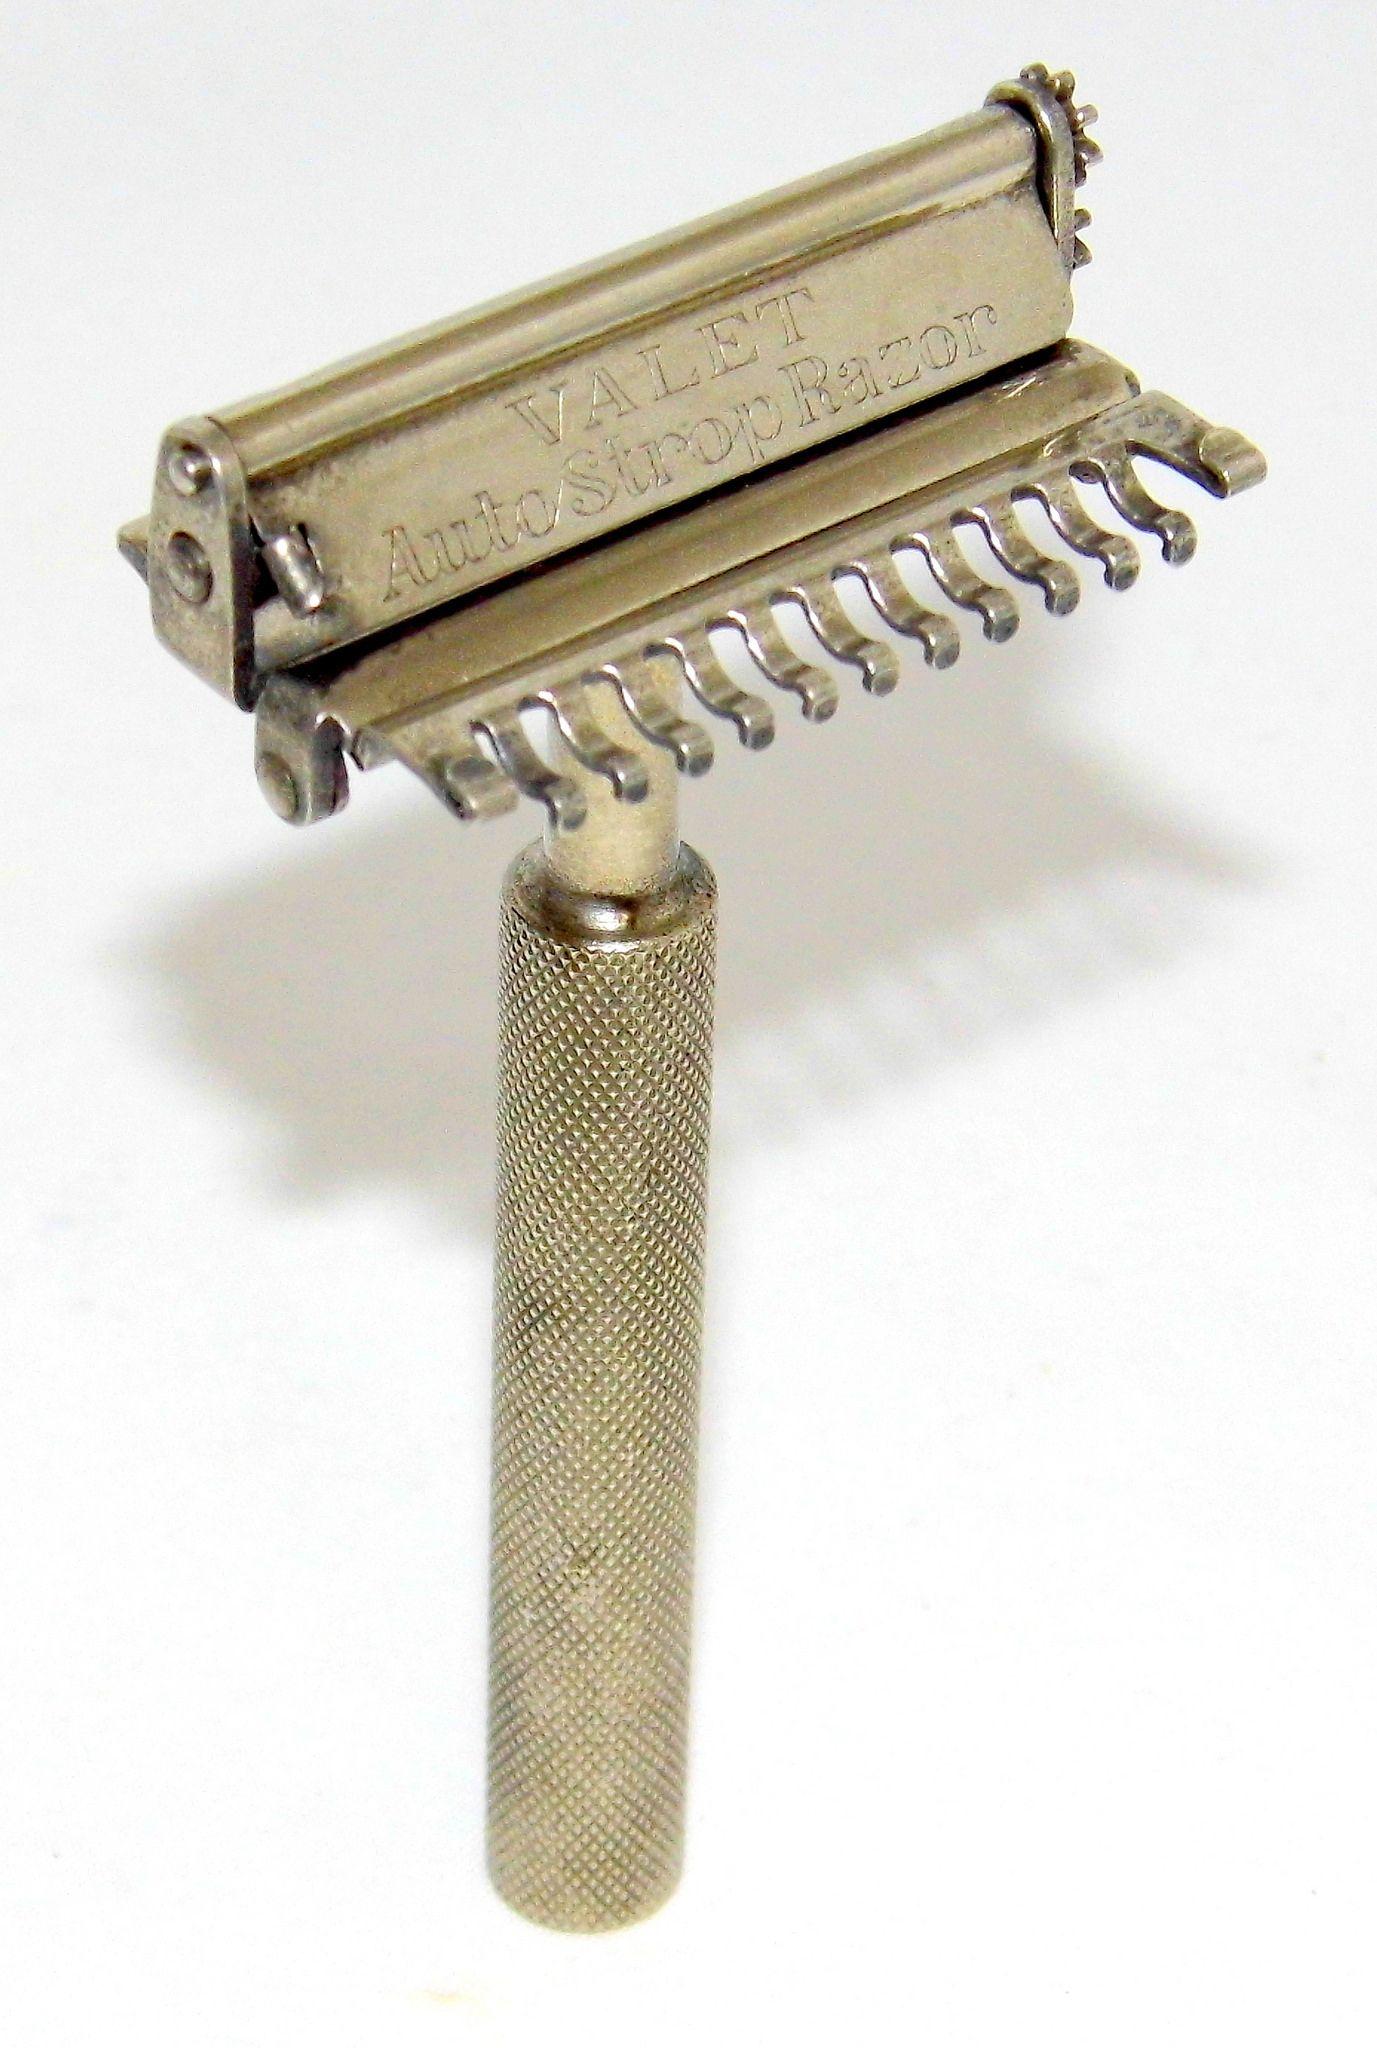 Vintage Valet AutoStrop Single Edge Safety Razor, Model